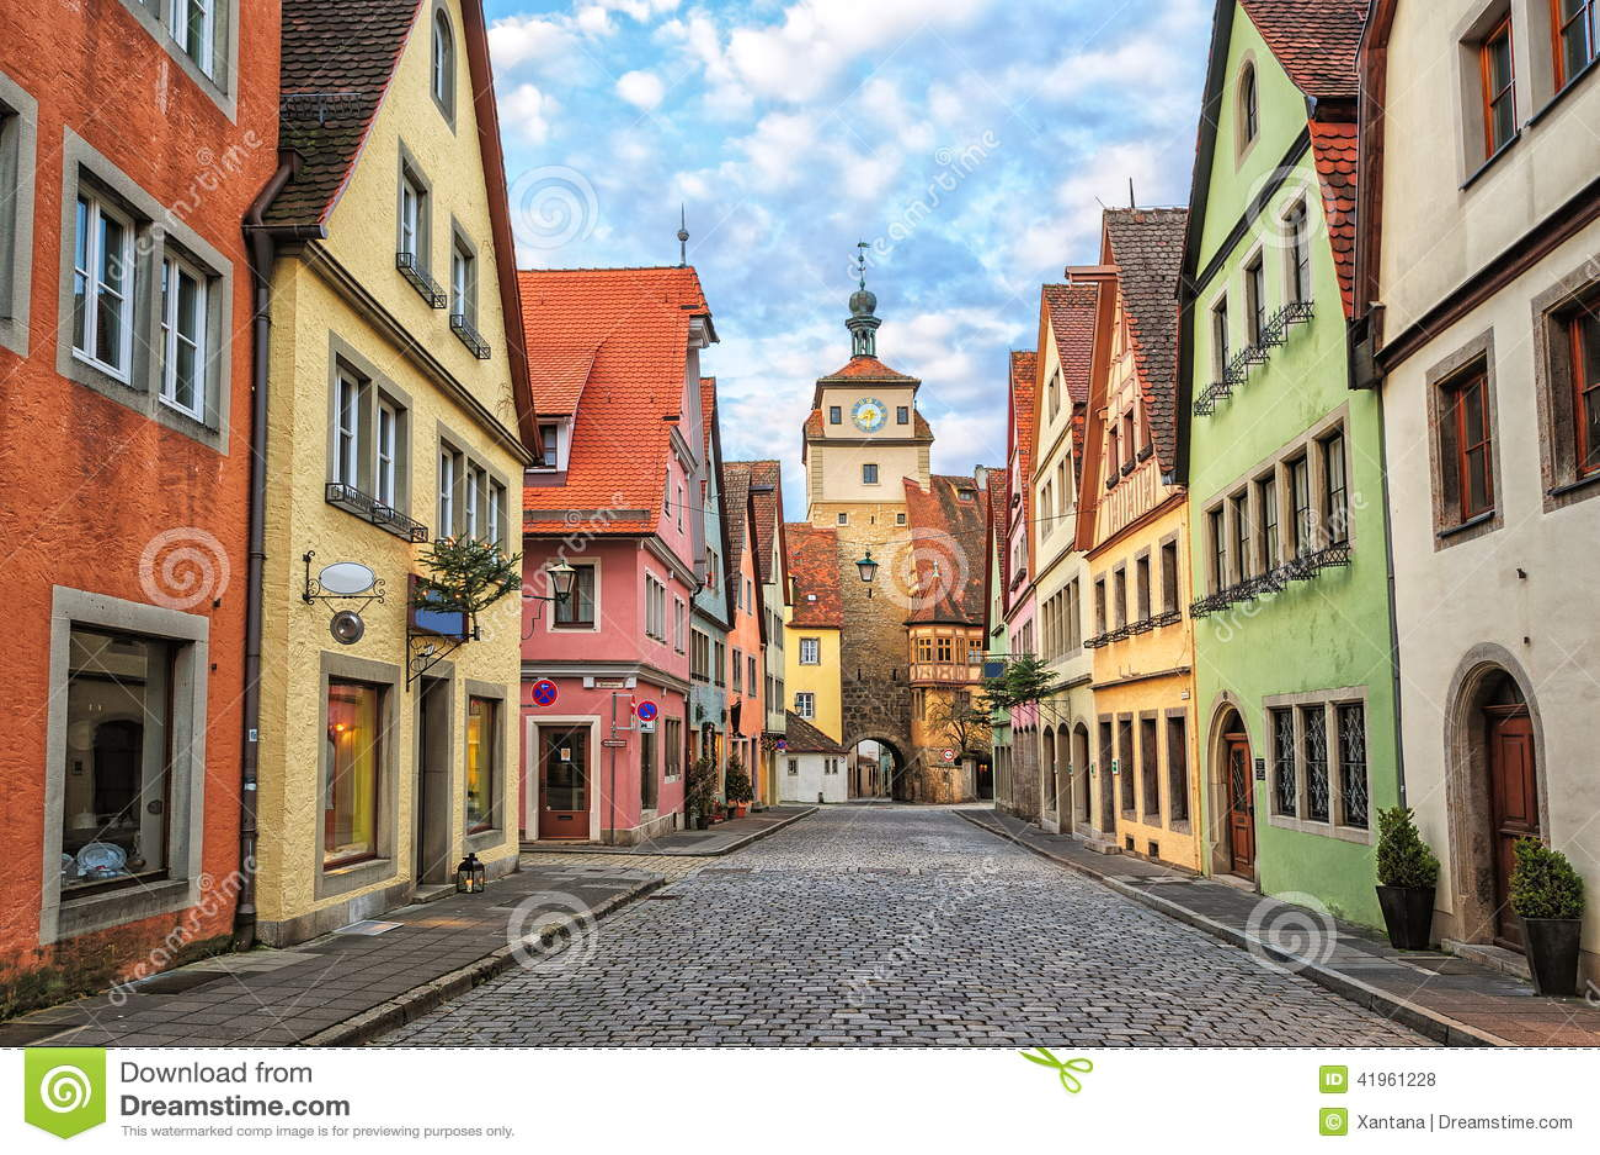 Gay Dating Rothenburg ob der Tauber - meinestadtde